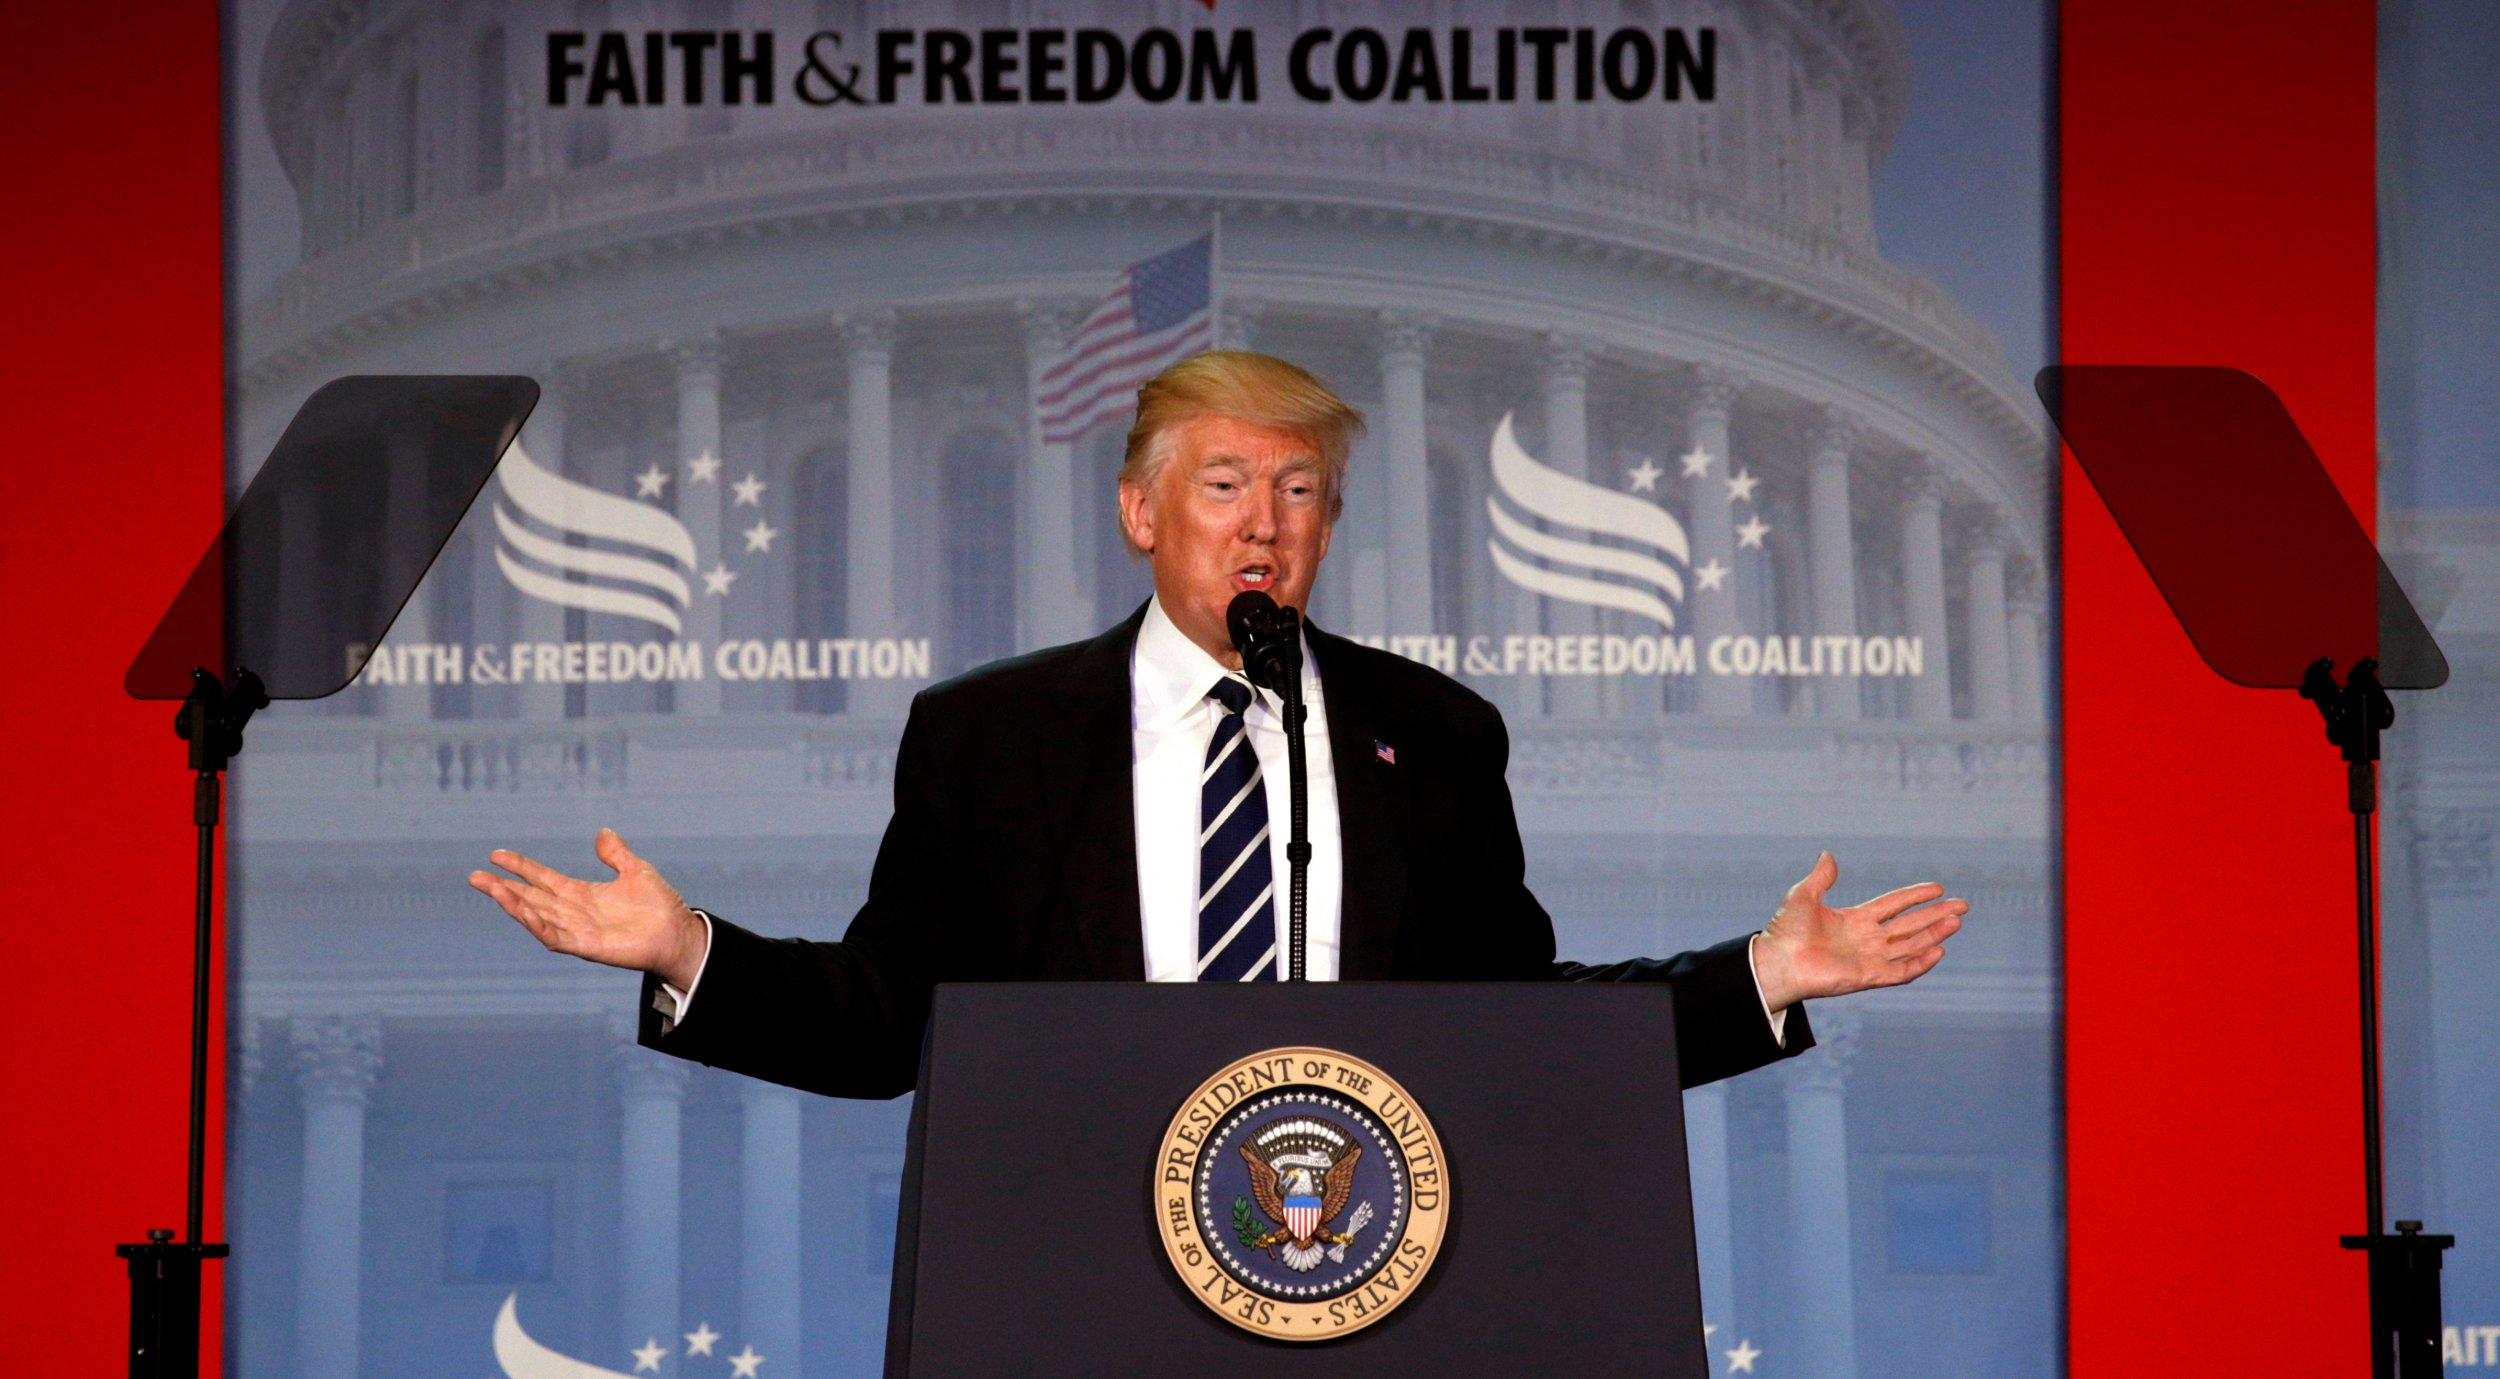 6-26-17 Donald Trump